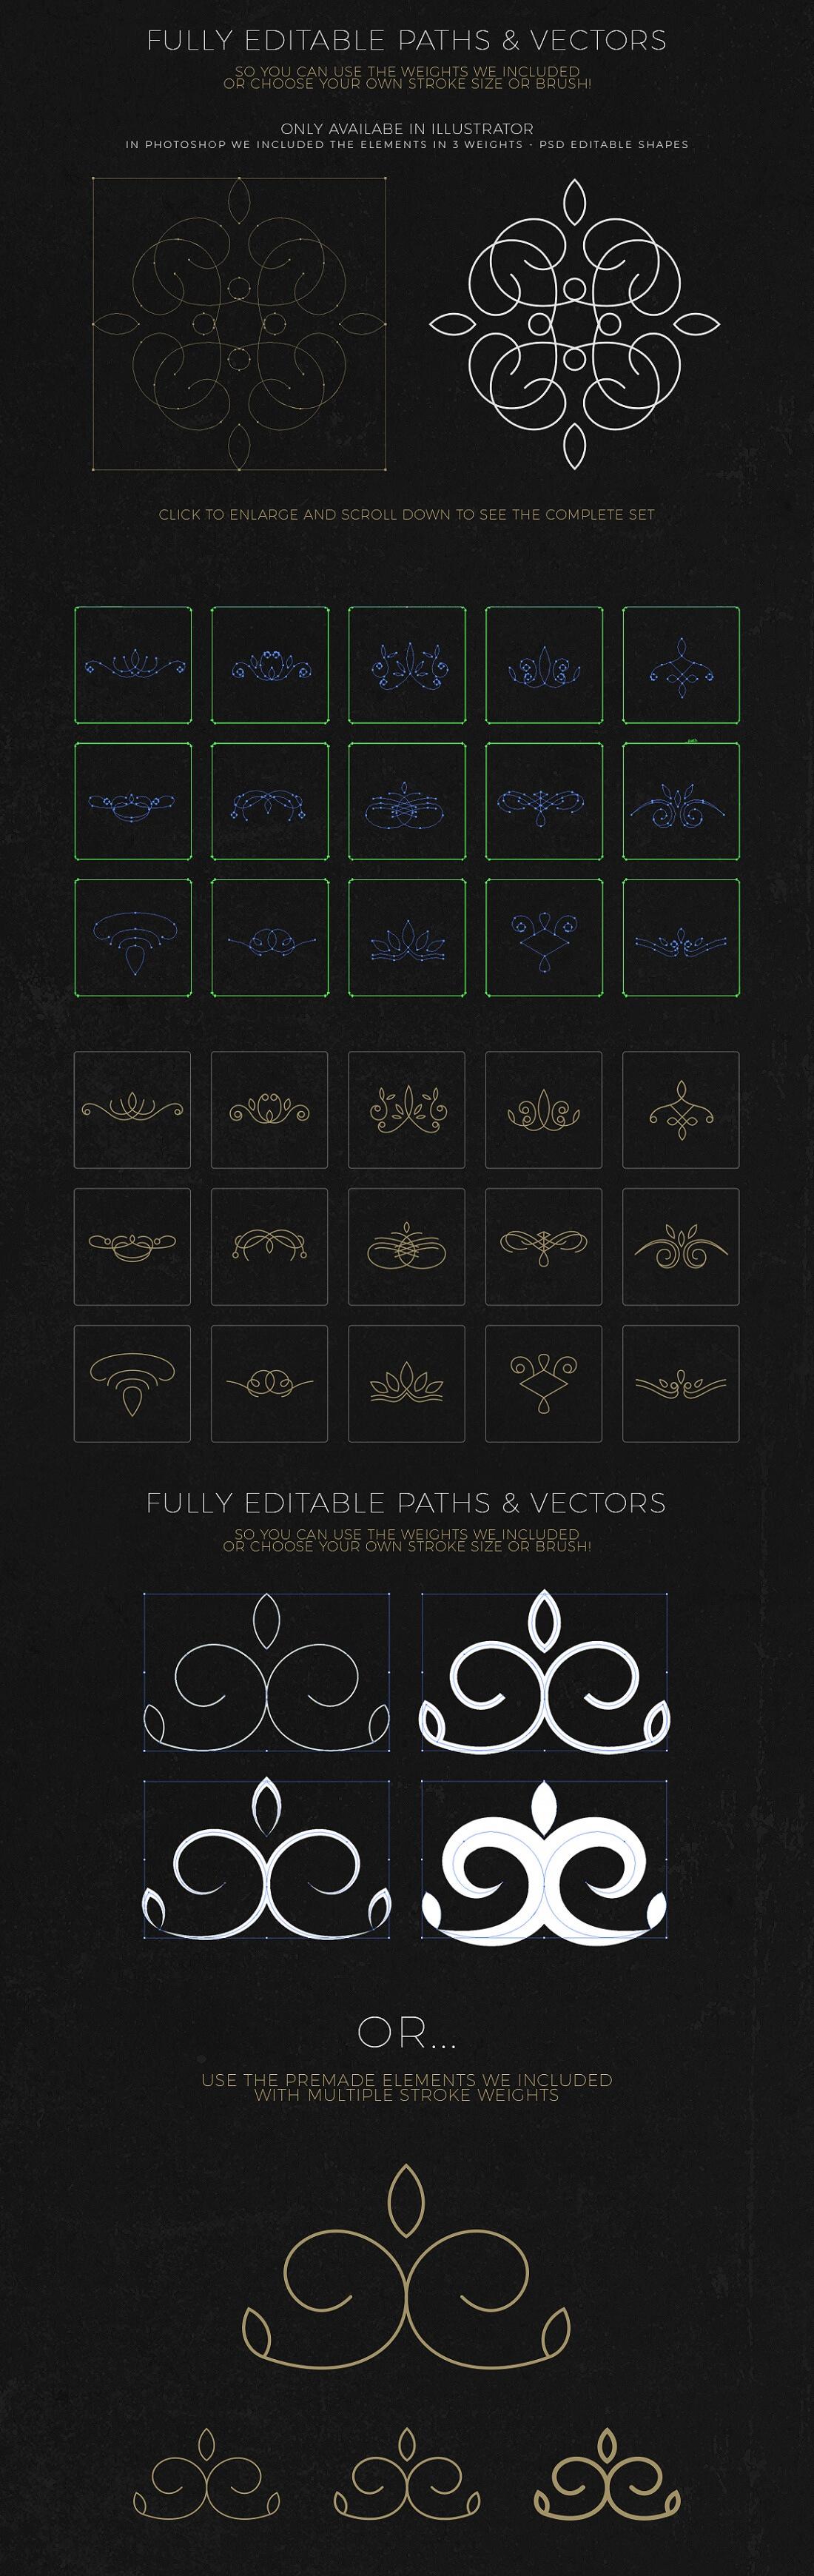 Professional logo creation kit bundle with 500 elements only professional logo creation kit bundle with 500 elements only 14 mightydeals sciox Choice Image